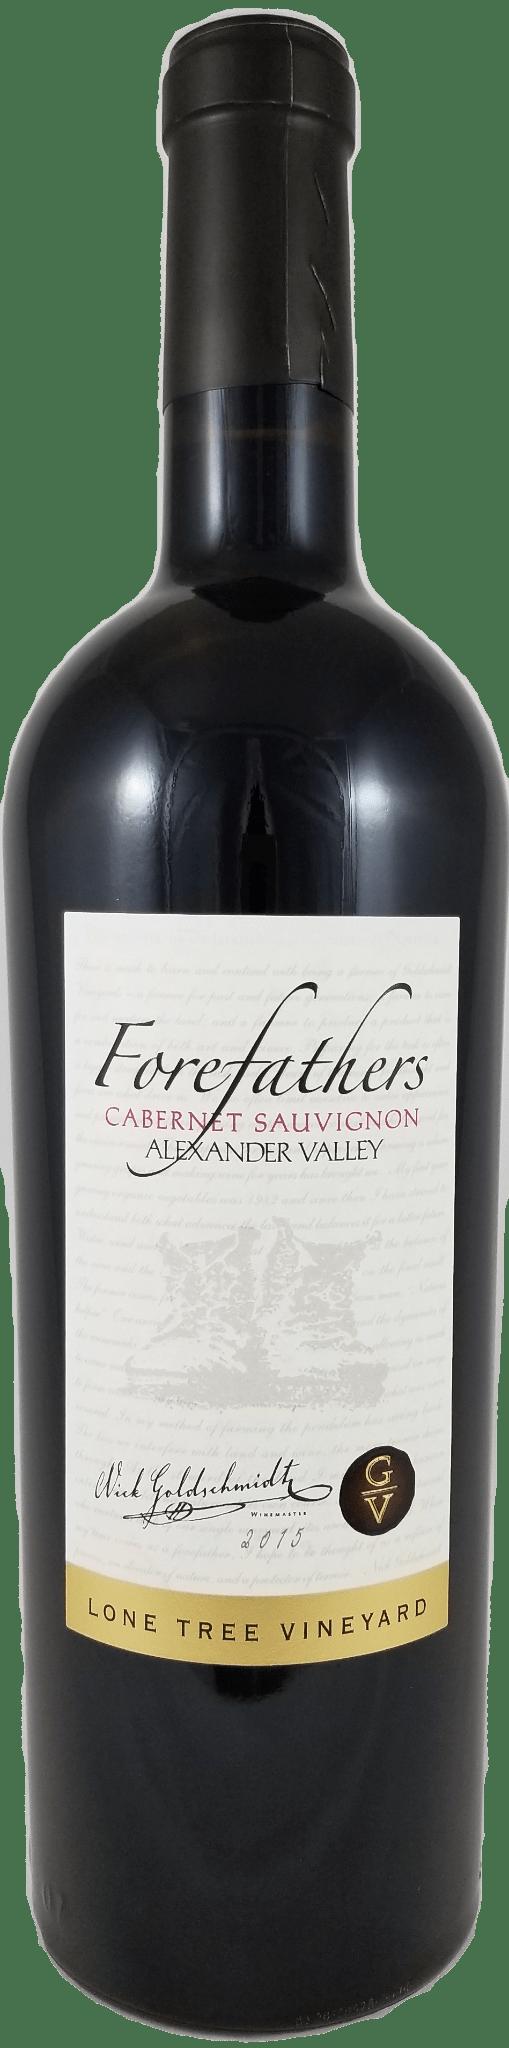 goldschmidt_15forfatherscab_bottle1-1-1-1